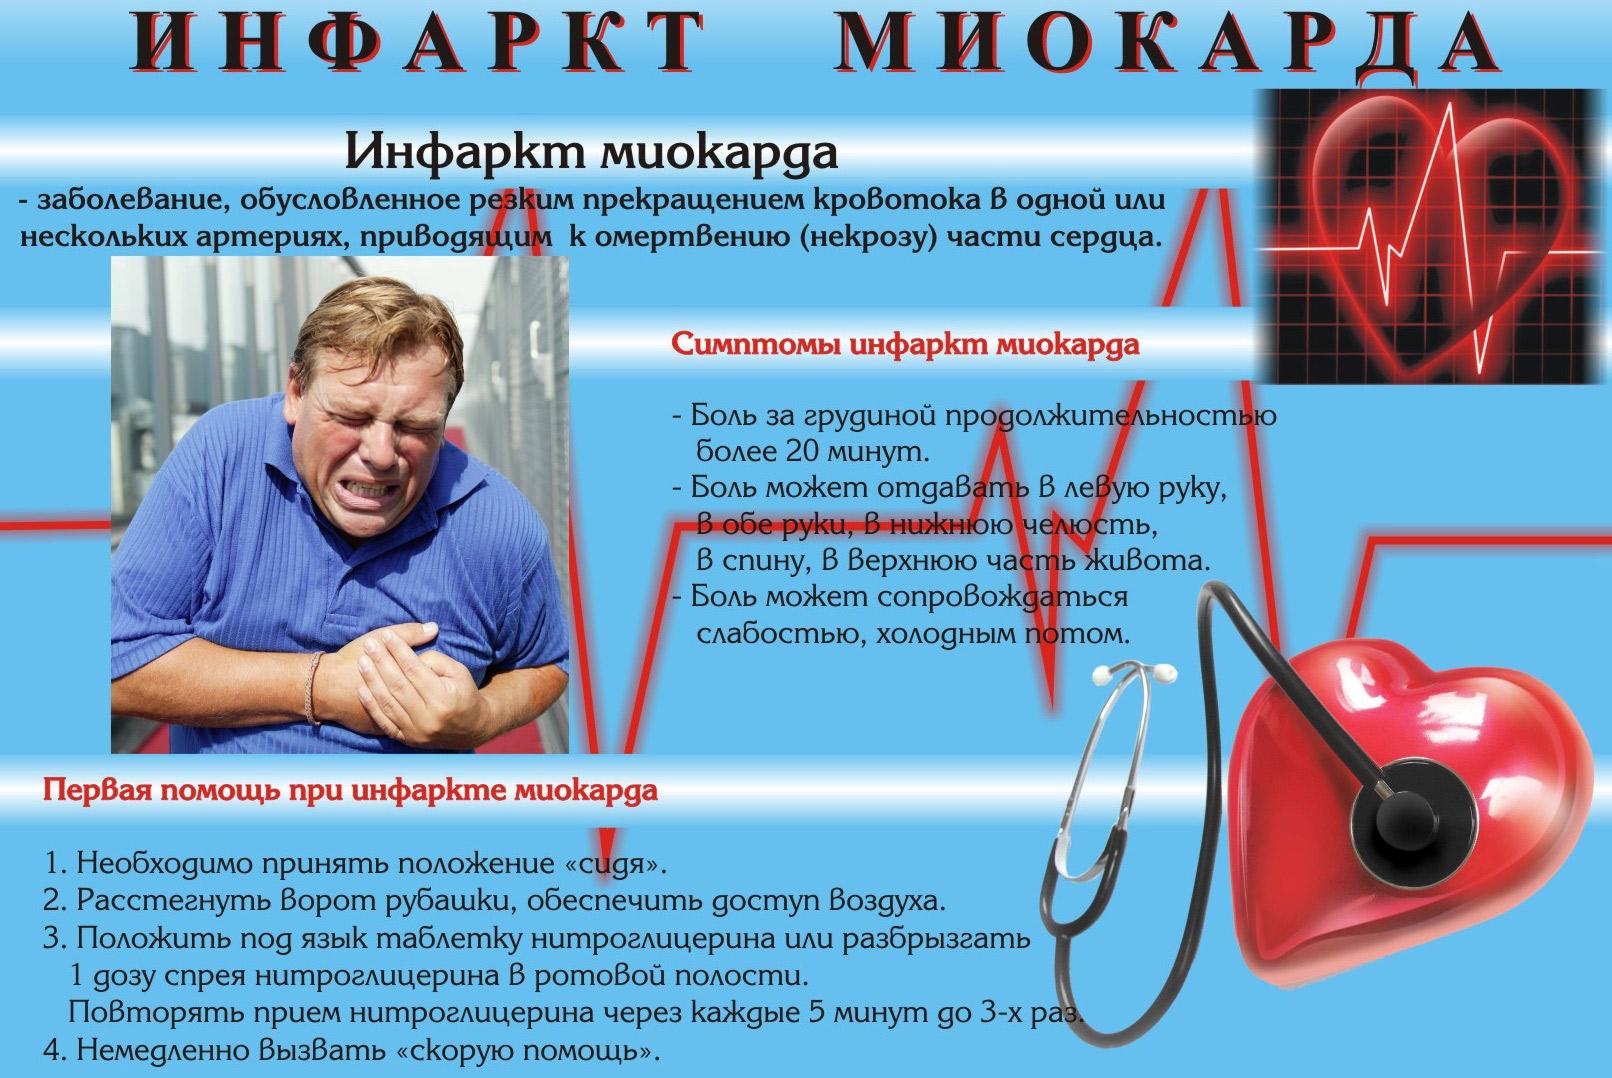 Миокардит – лечение, симптомы и профилактика